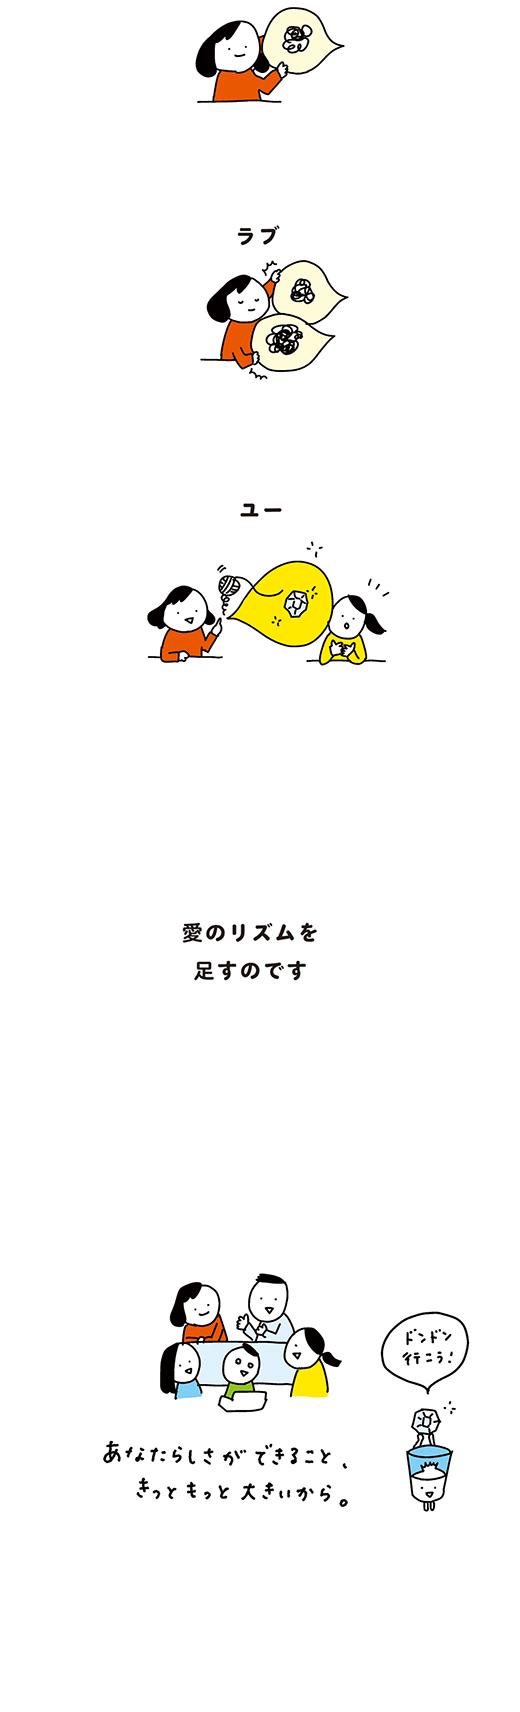 200520_kotaete_04